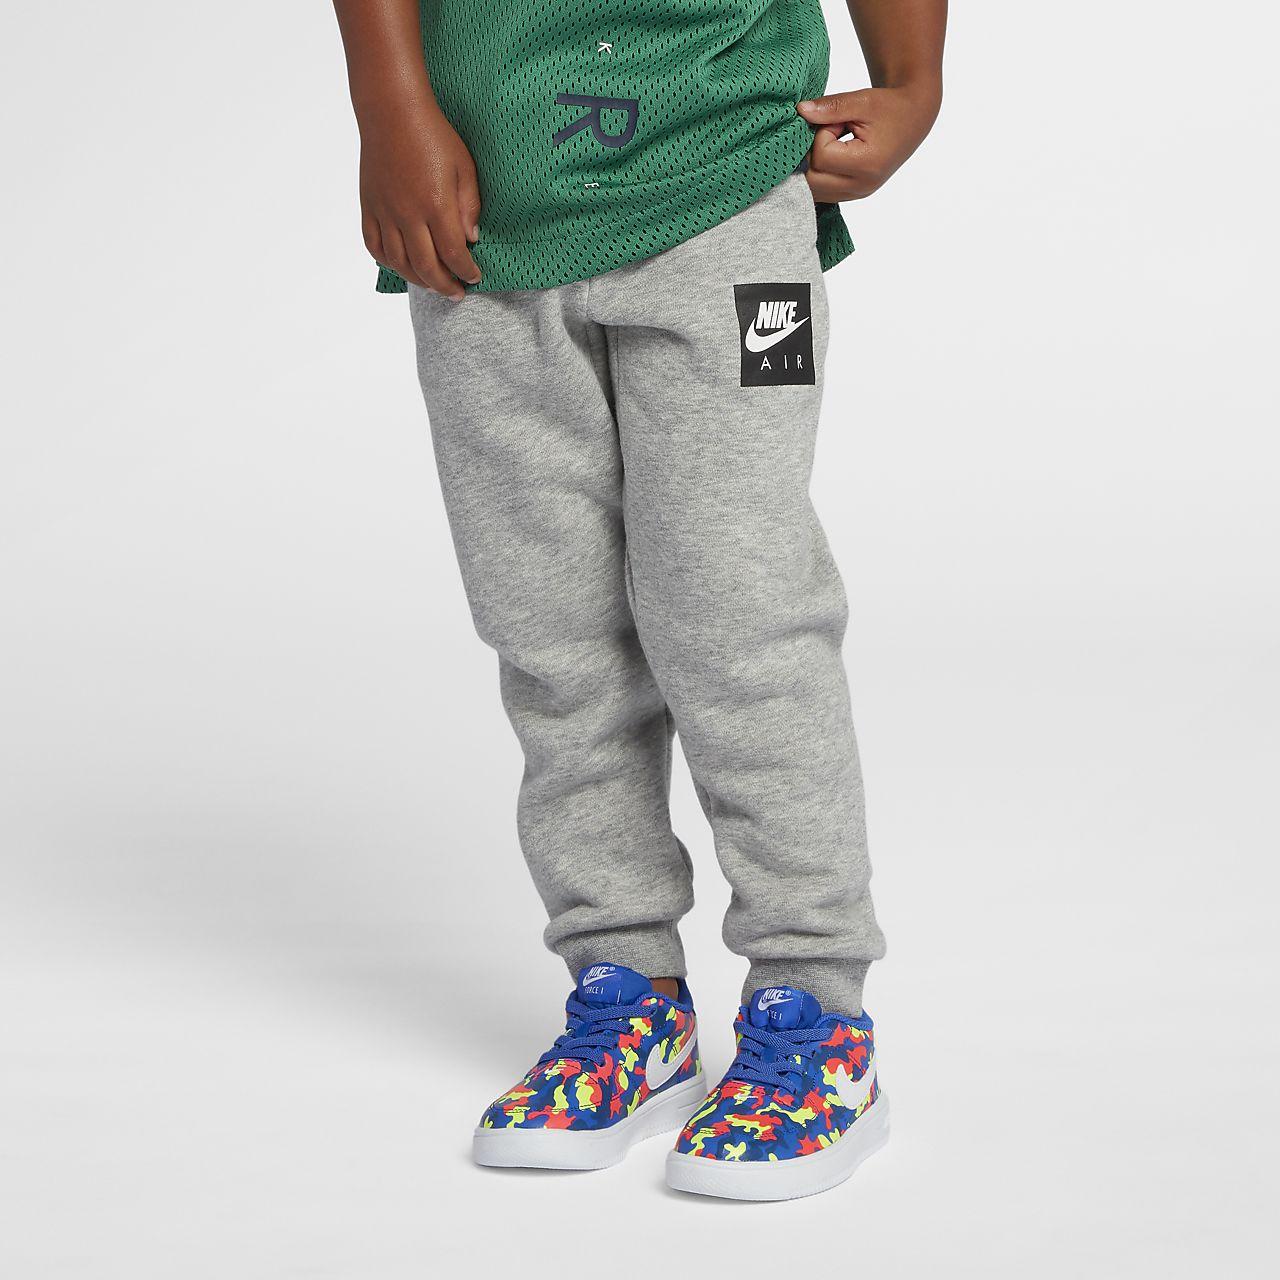 Pantalon Nike Air pour Petit enfant